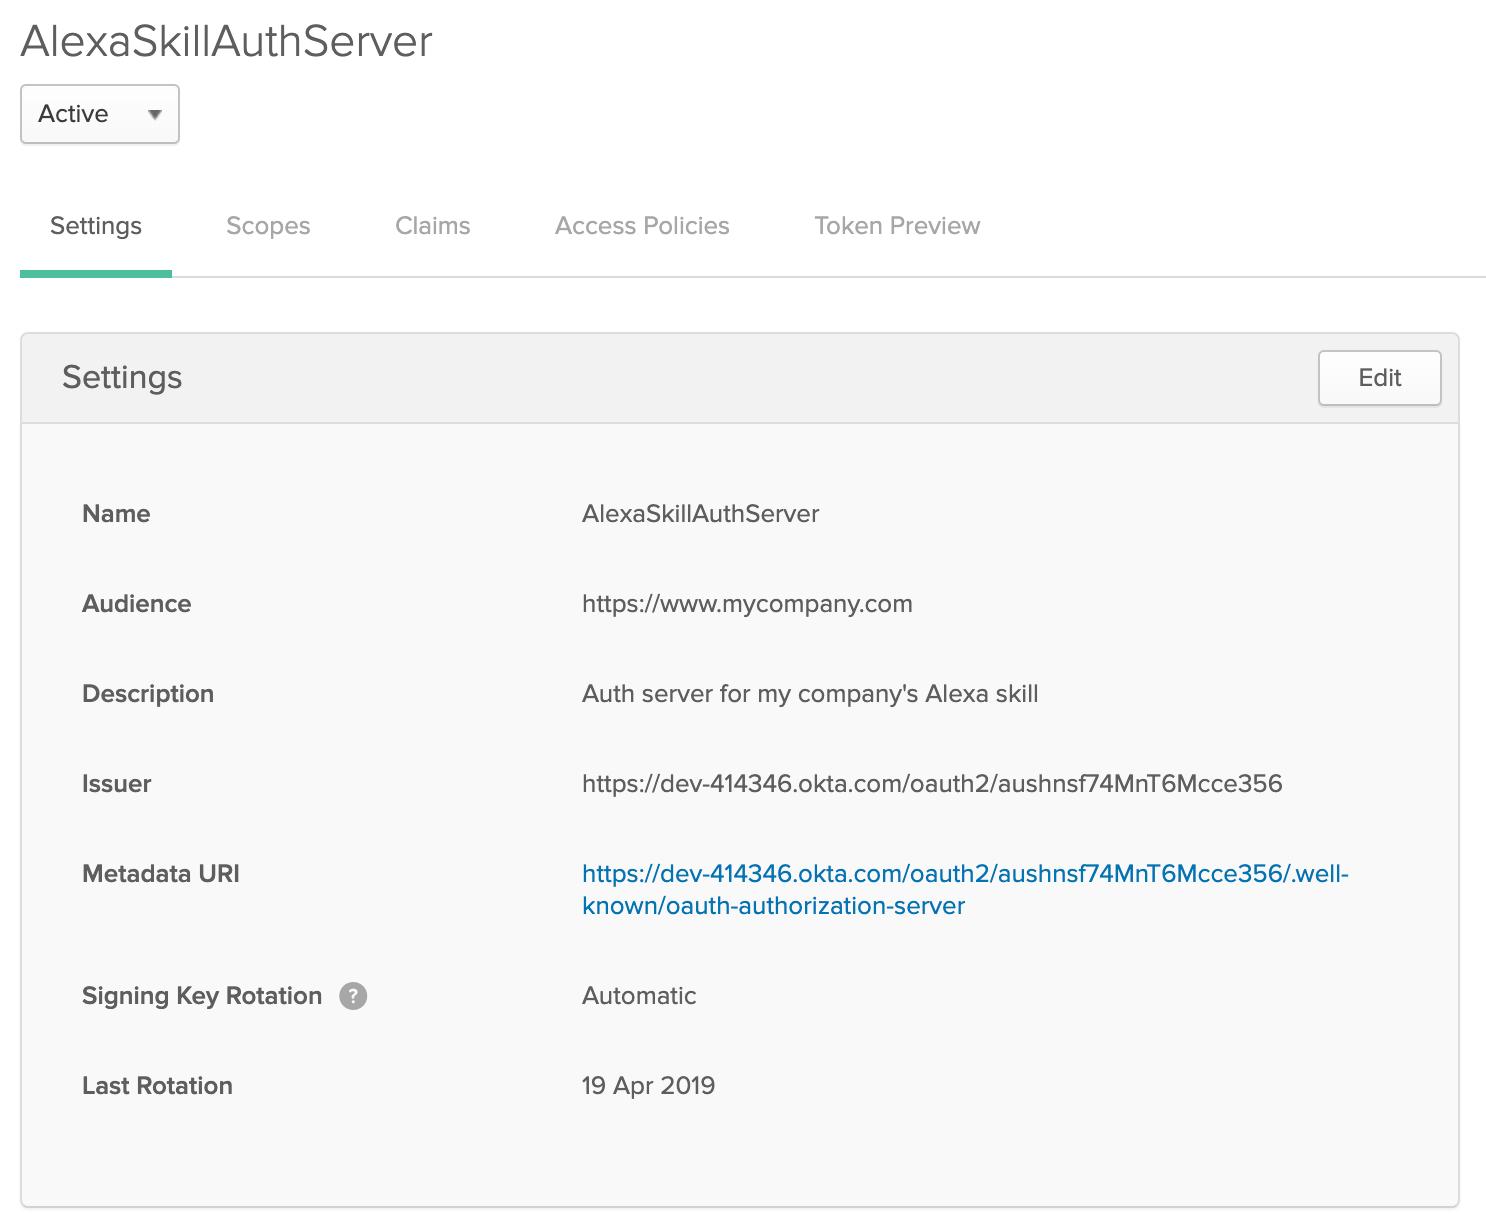 Alexa .NET Auth Server in Okta